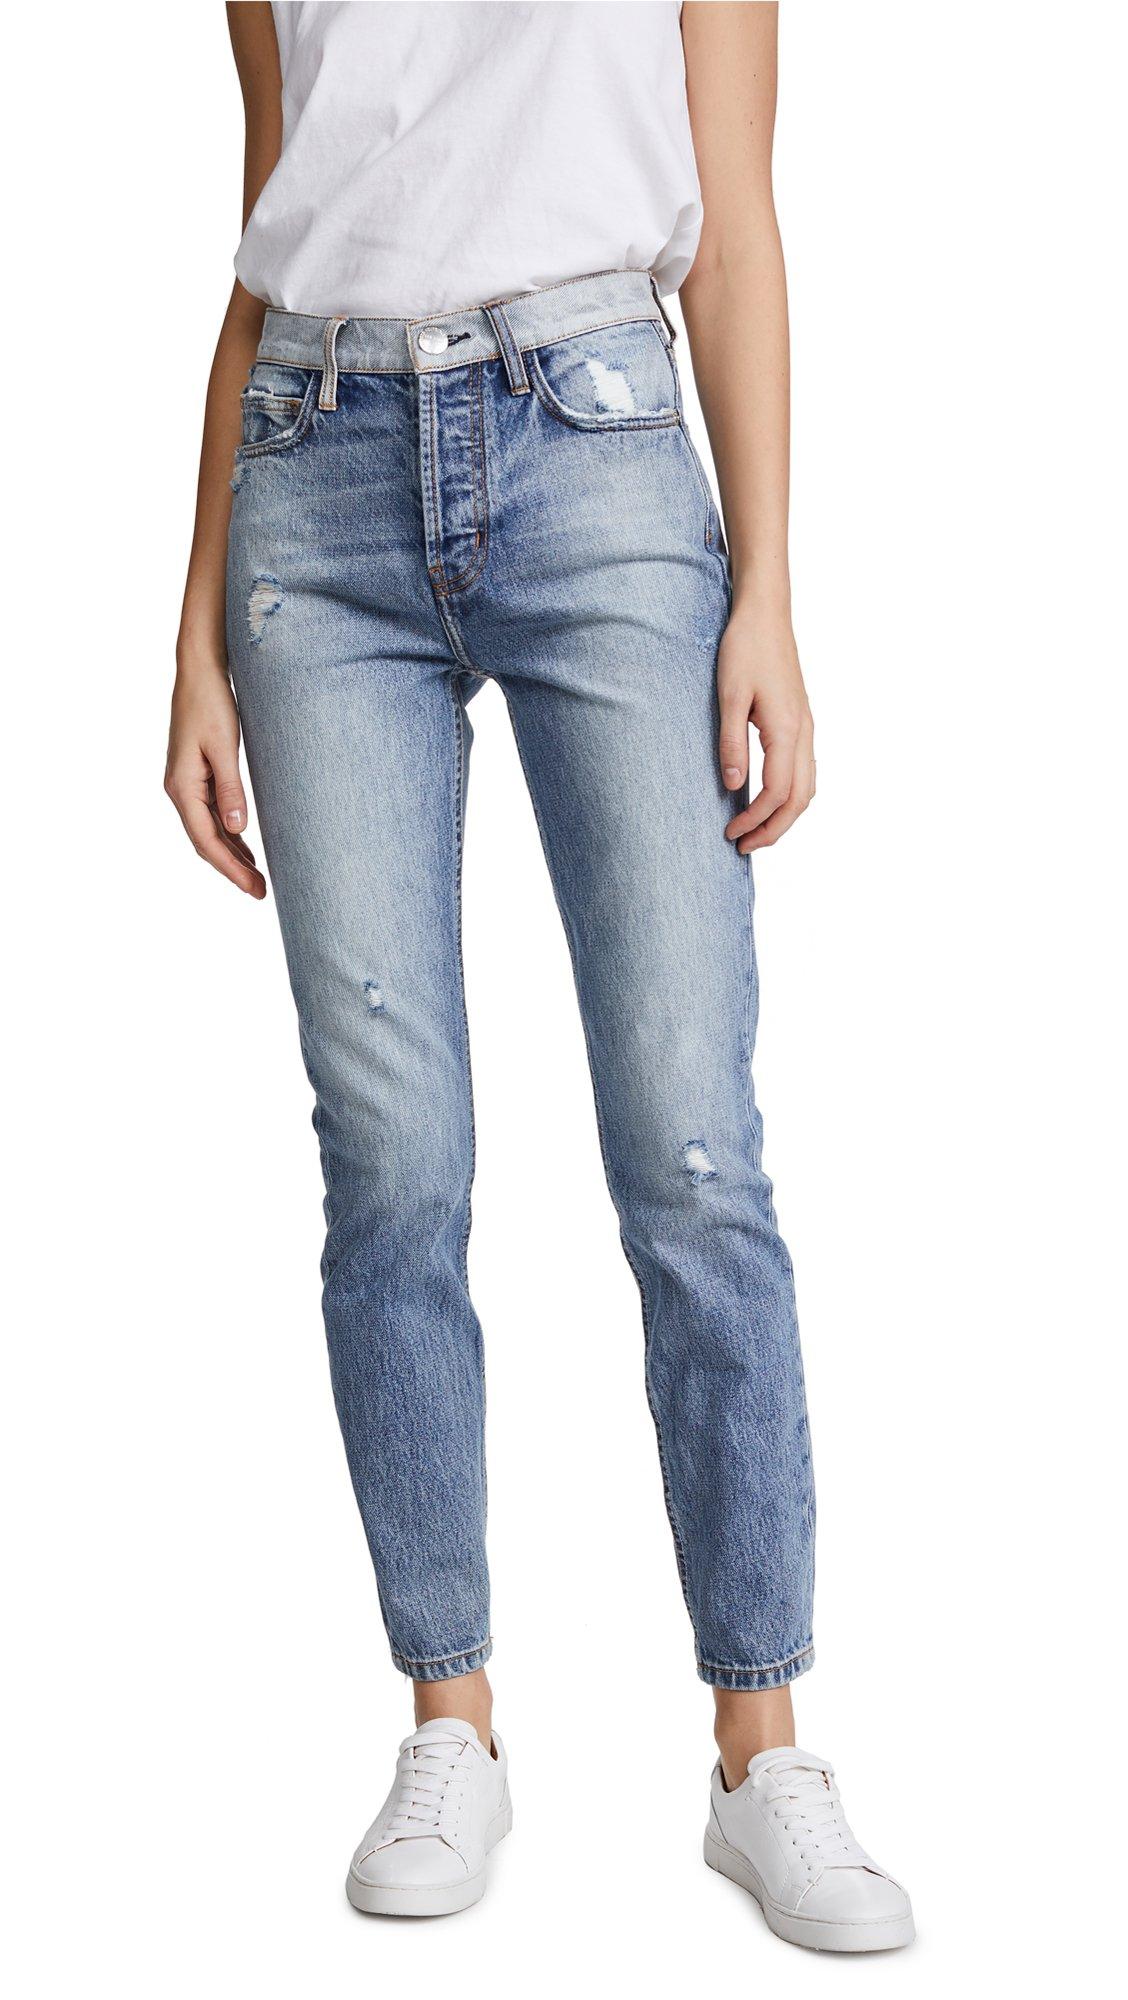 Current/Elliott Women's The Ultra High Waist Skinny Jeans, Branwen Destroy, 27